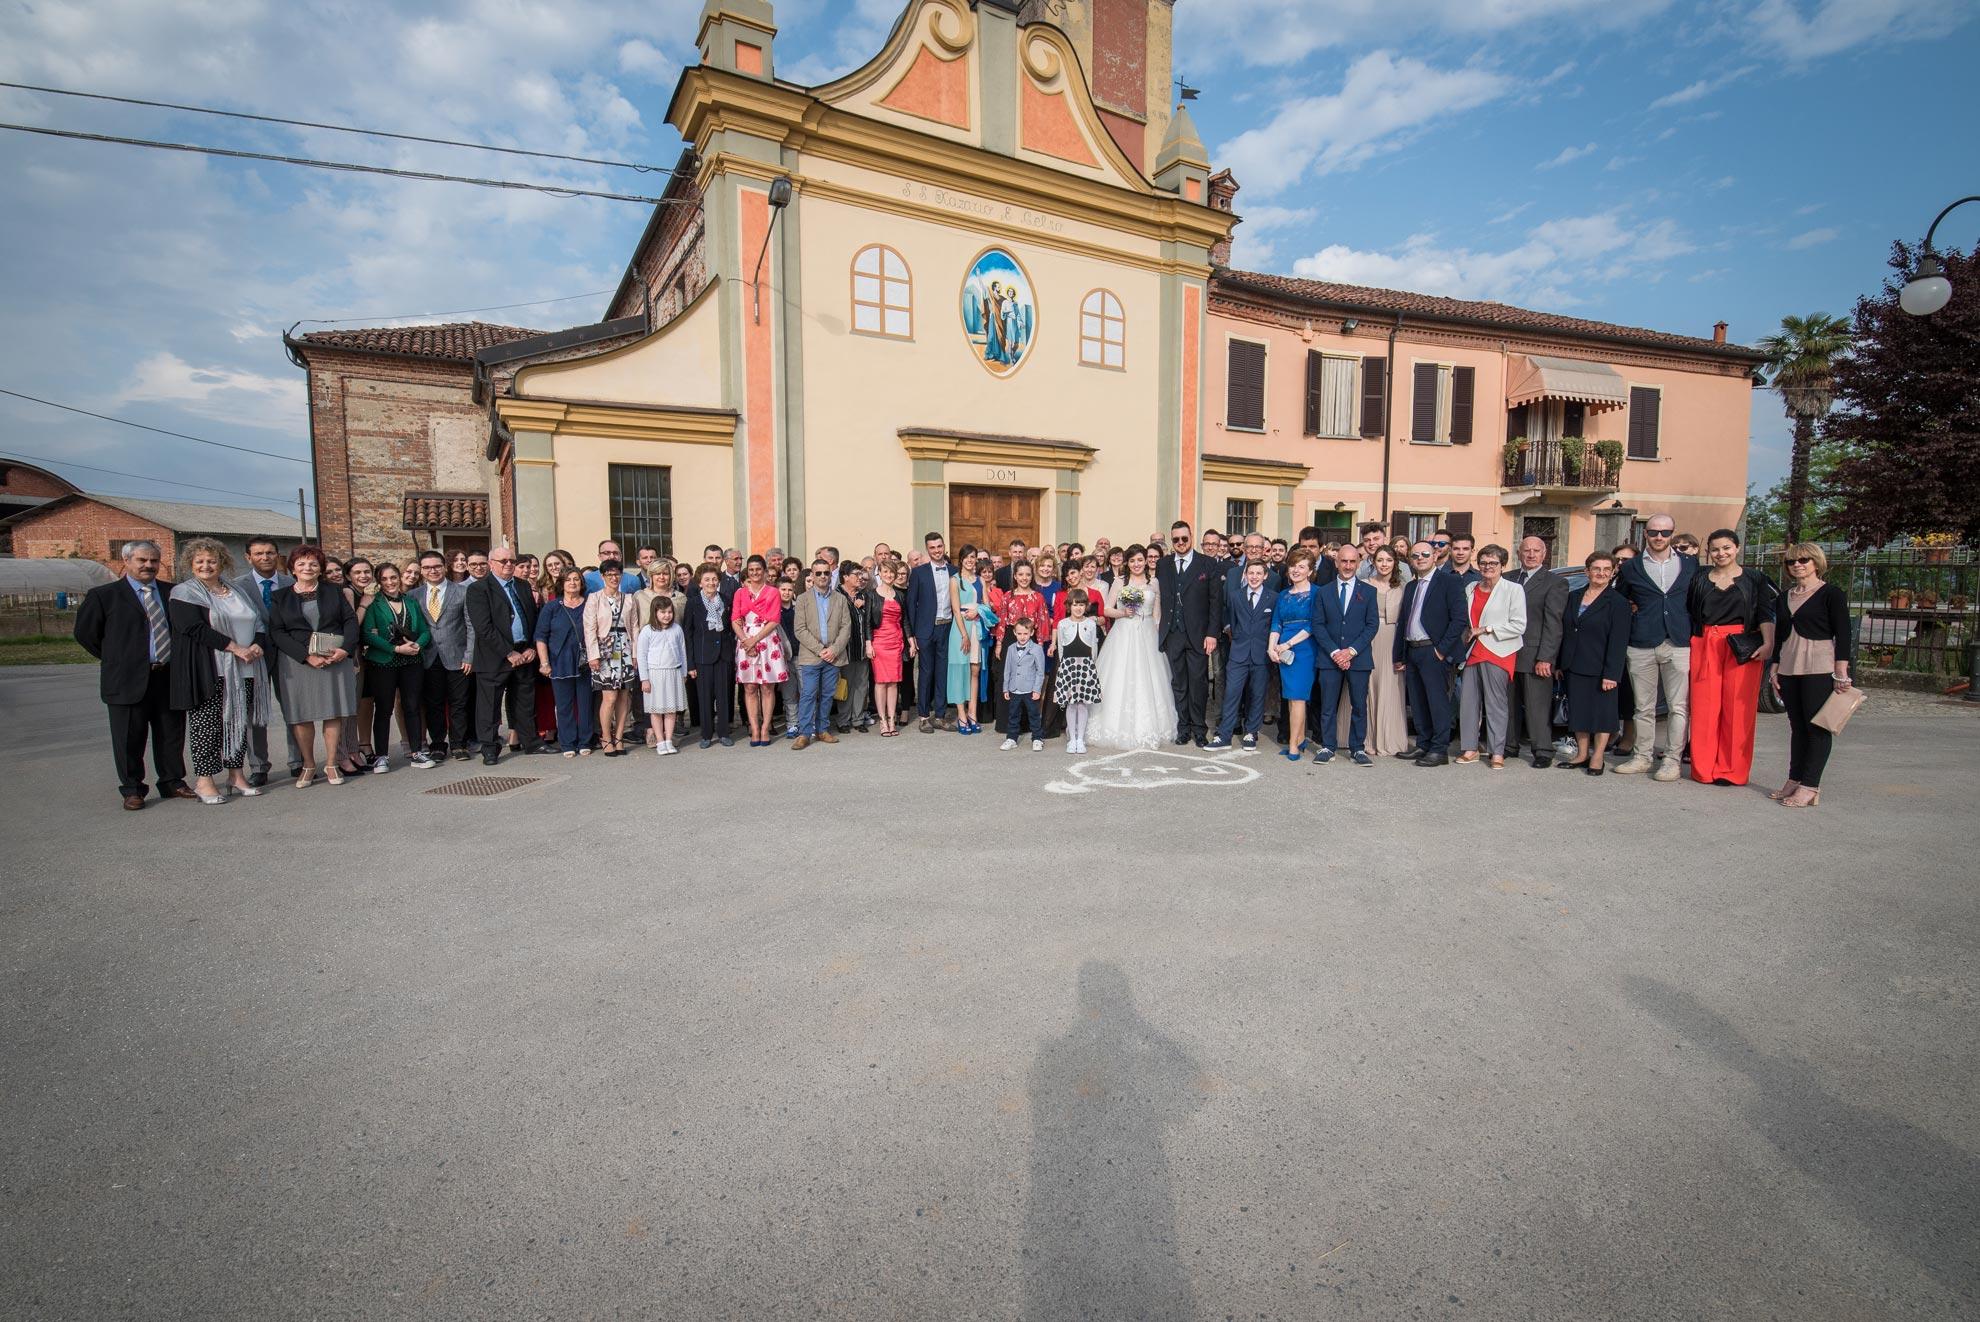 Matrimonio a Narzole Lorenza Diego - DSC 0626 - Fotografie matrimonio con parenti - Fotografie matrimonio con parenti